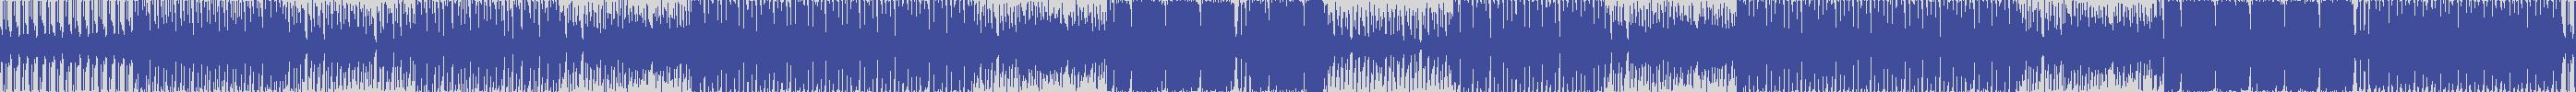 just_digital_records [JS1155] Jack Benassi - Bum Bum [Original Mix] audio wave form